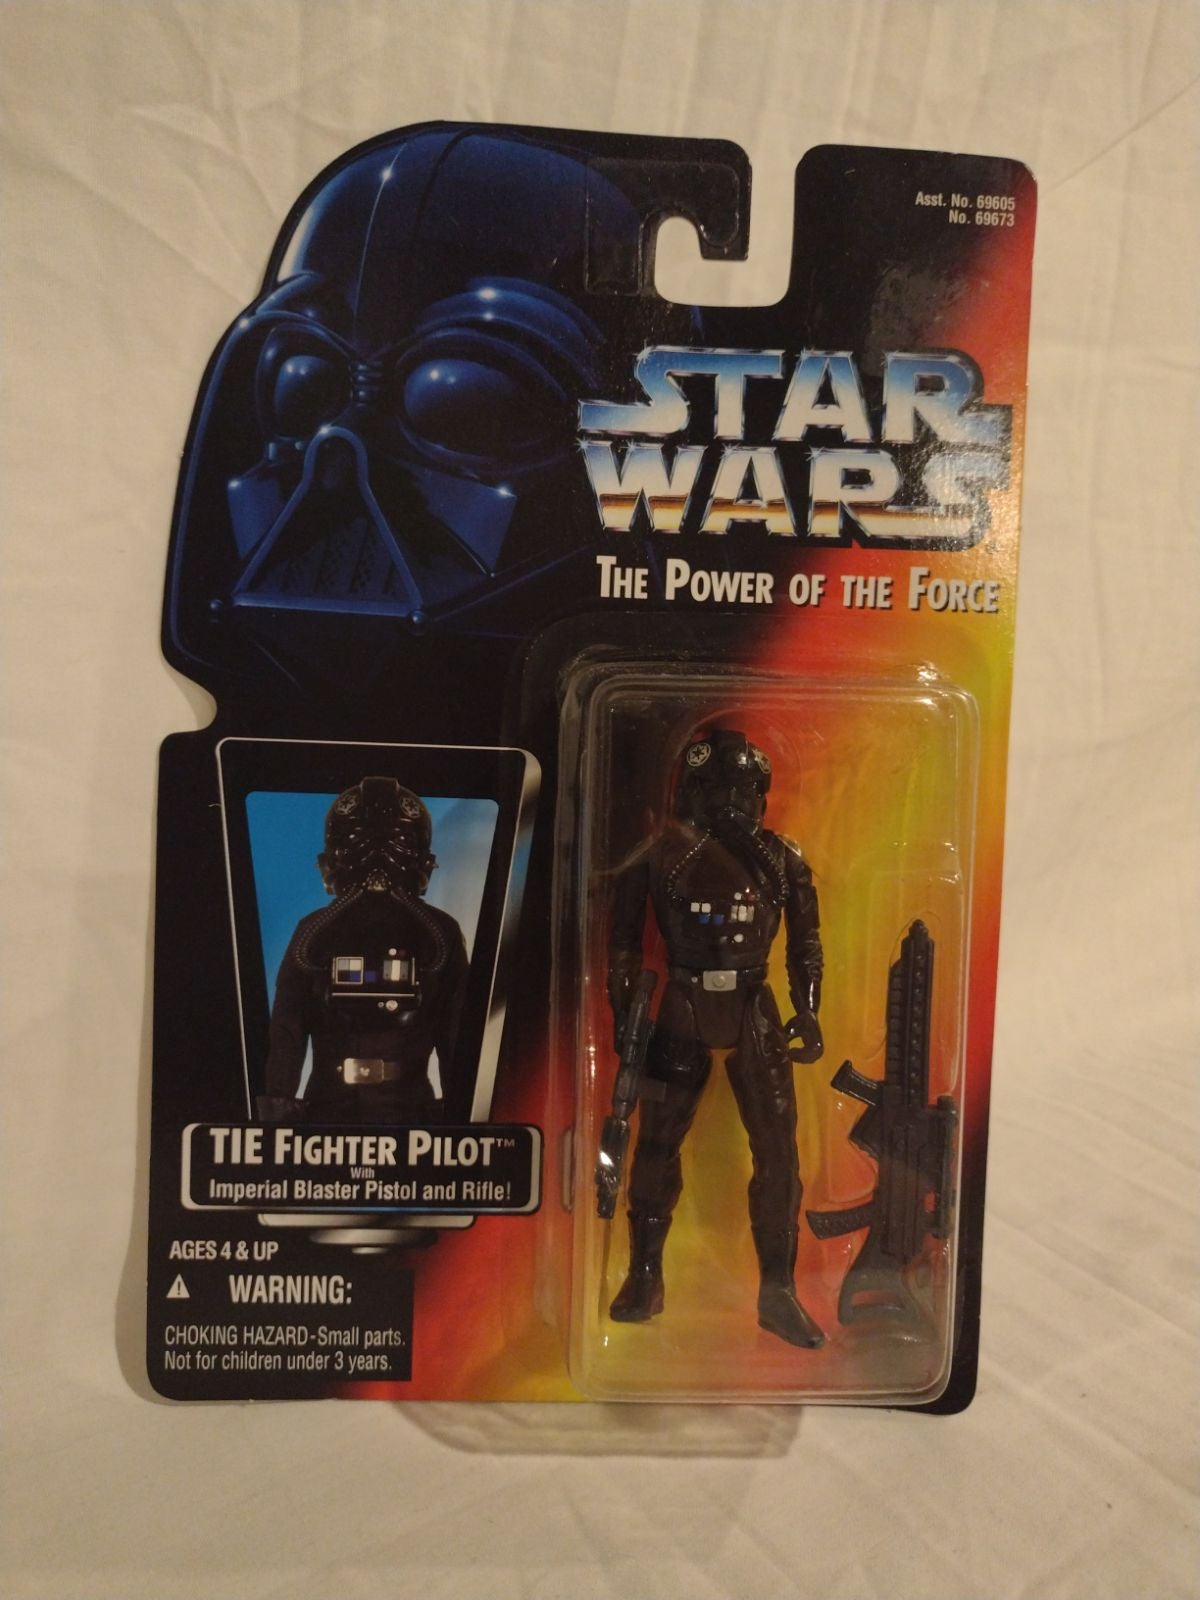 Star Wars 1995 Hasbro Tie Fighter pilot